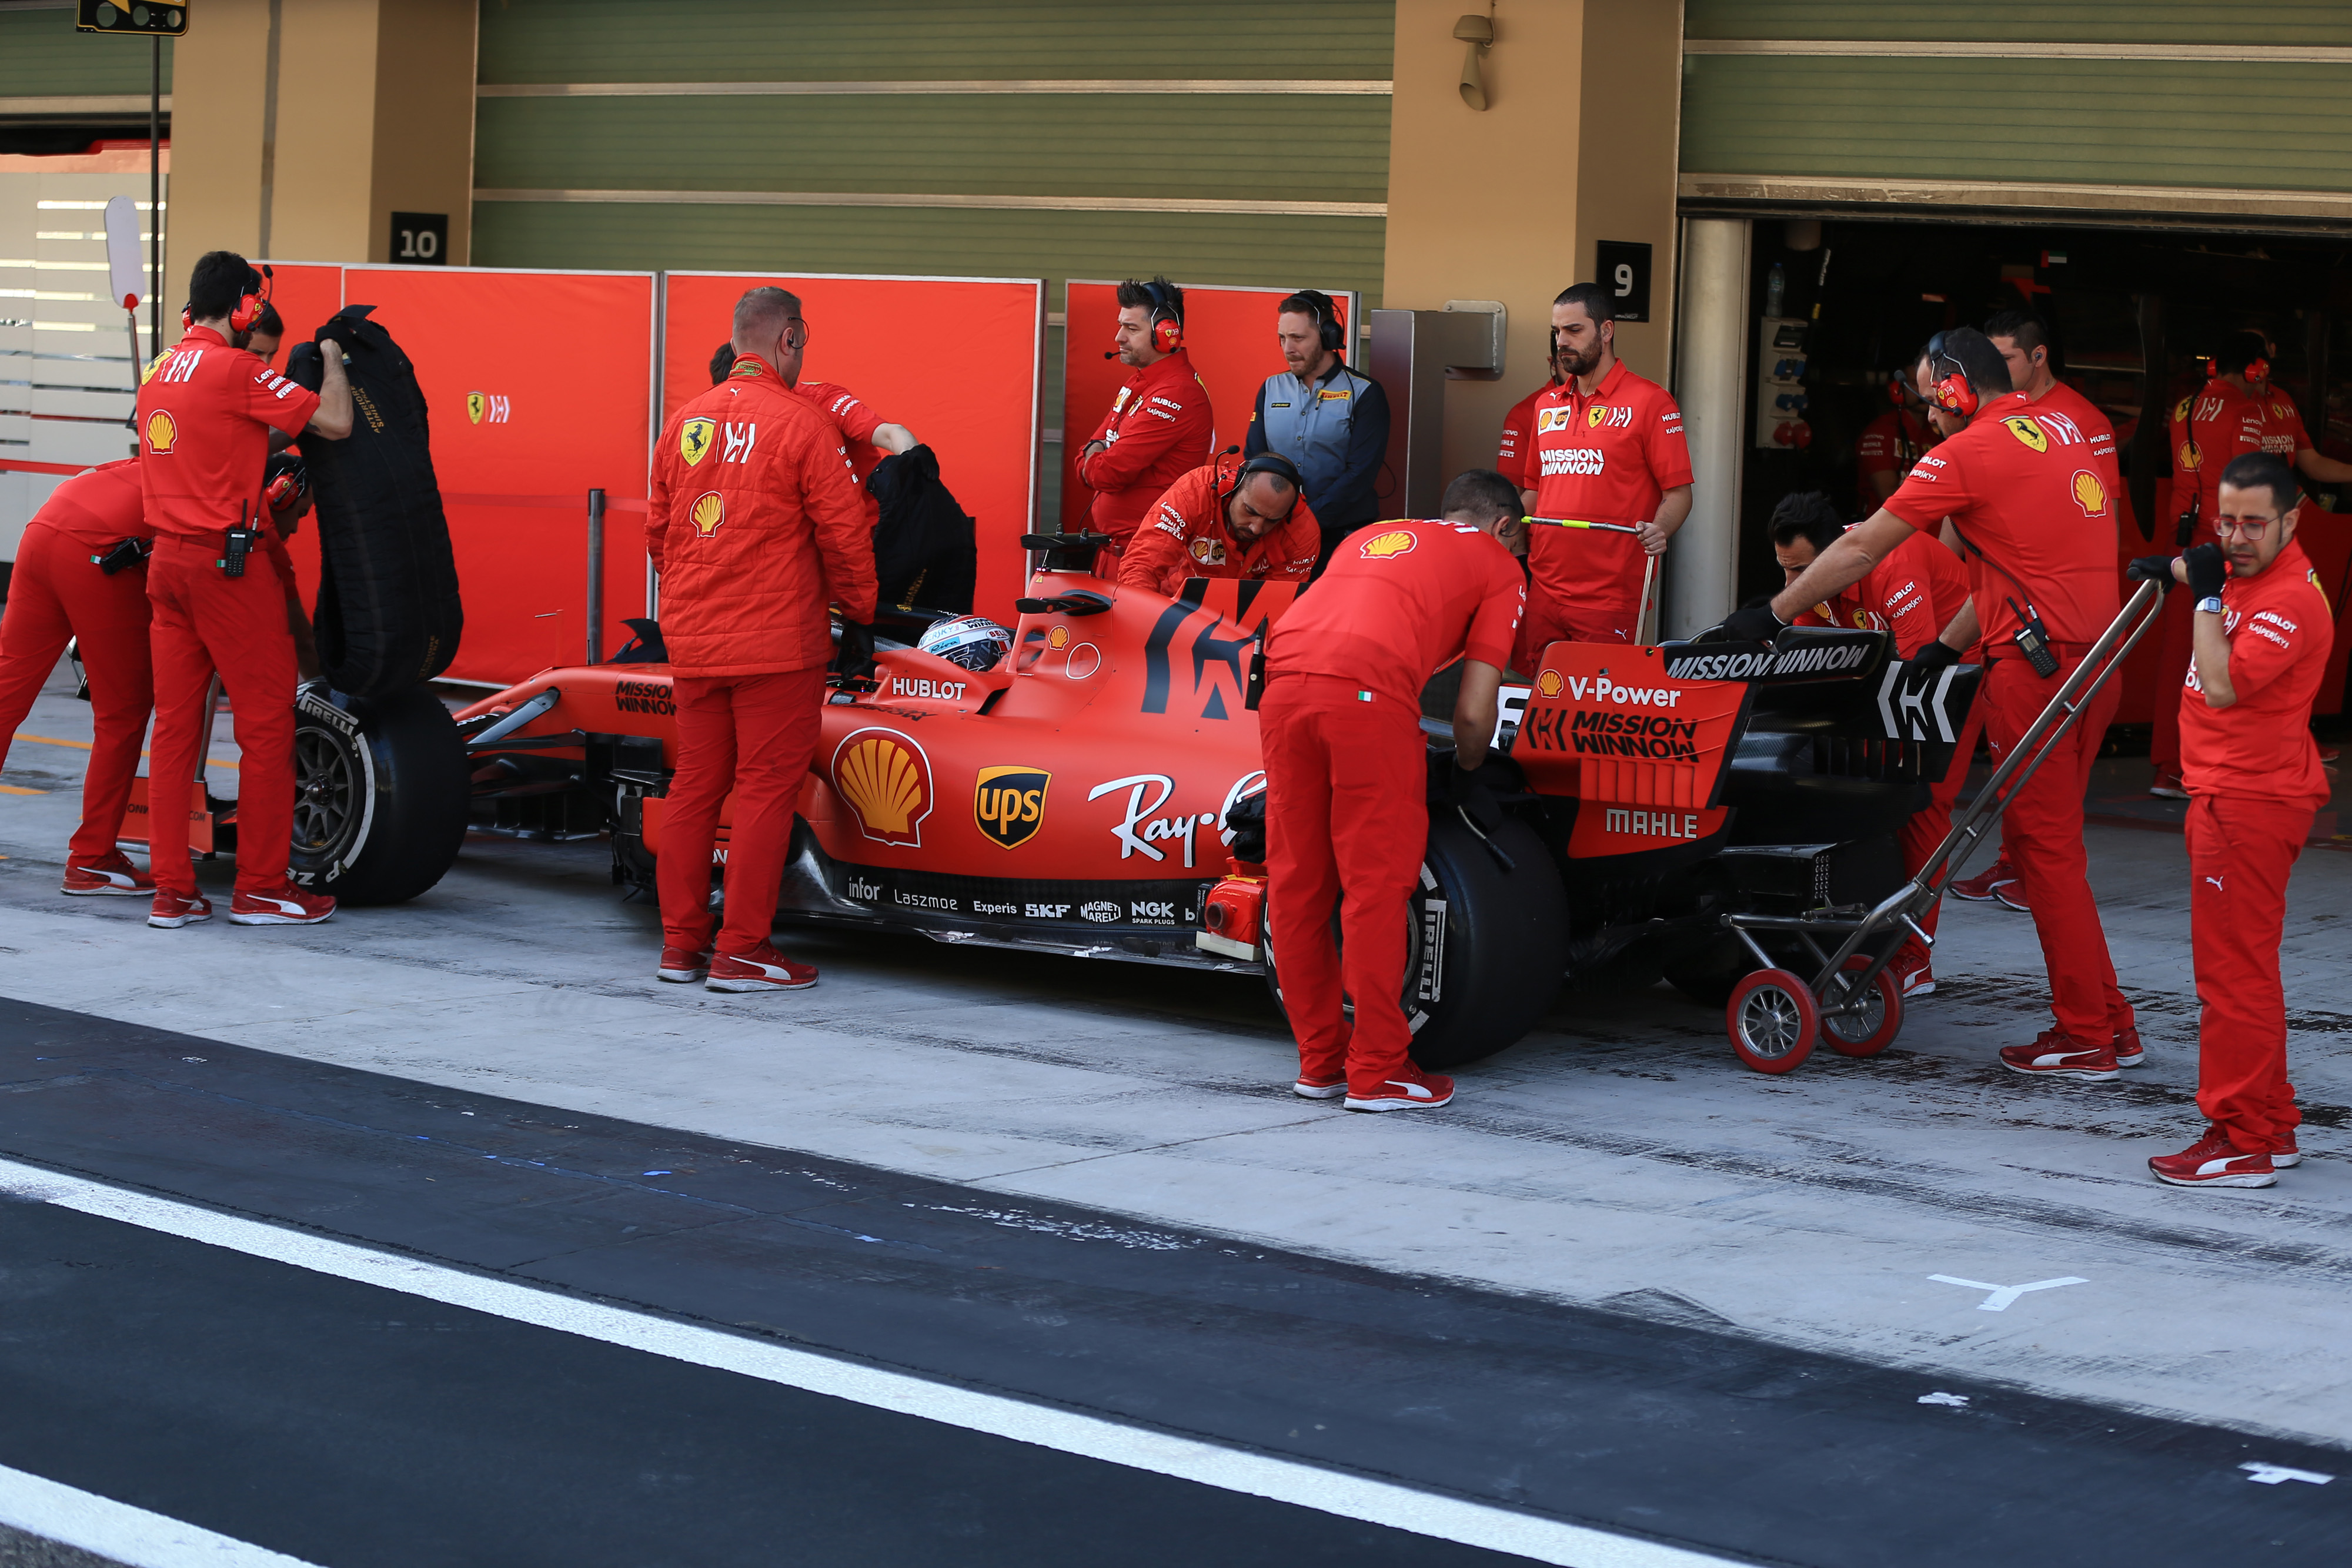 F1 Formula 1 Formula One Ferrari 18 inch mule car testing